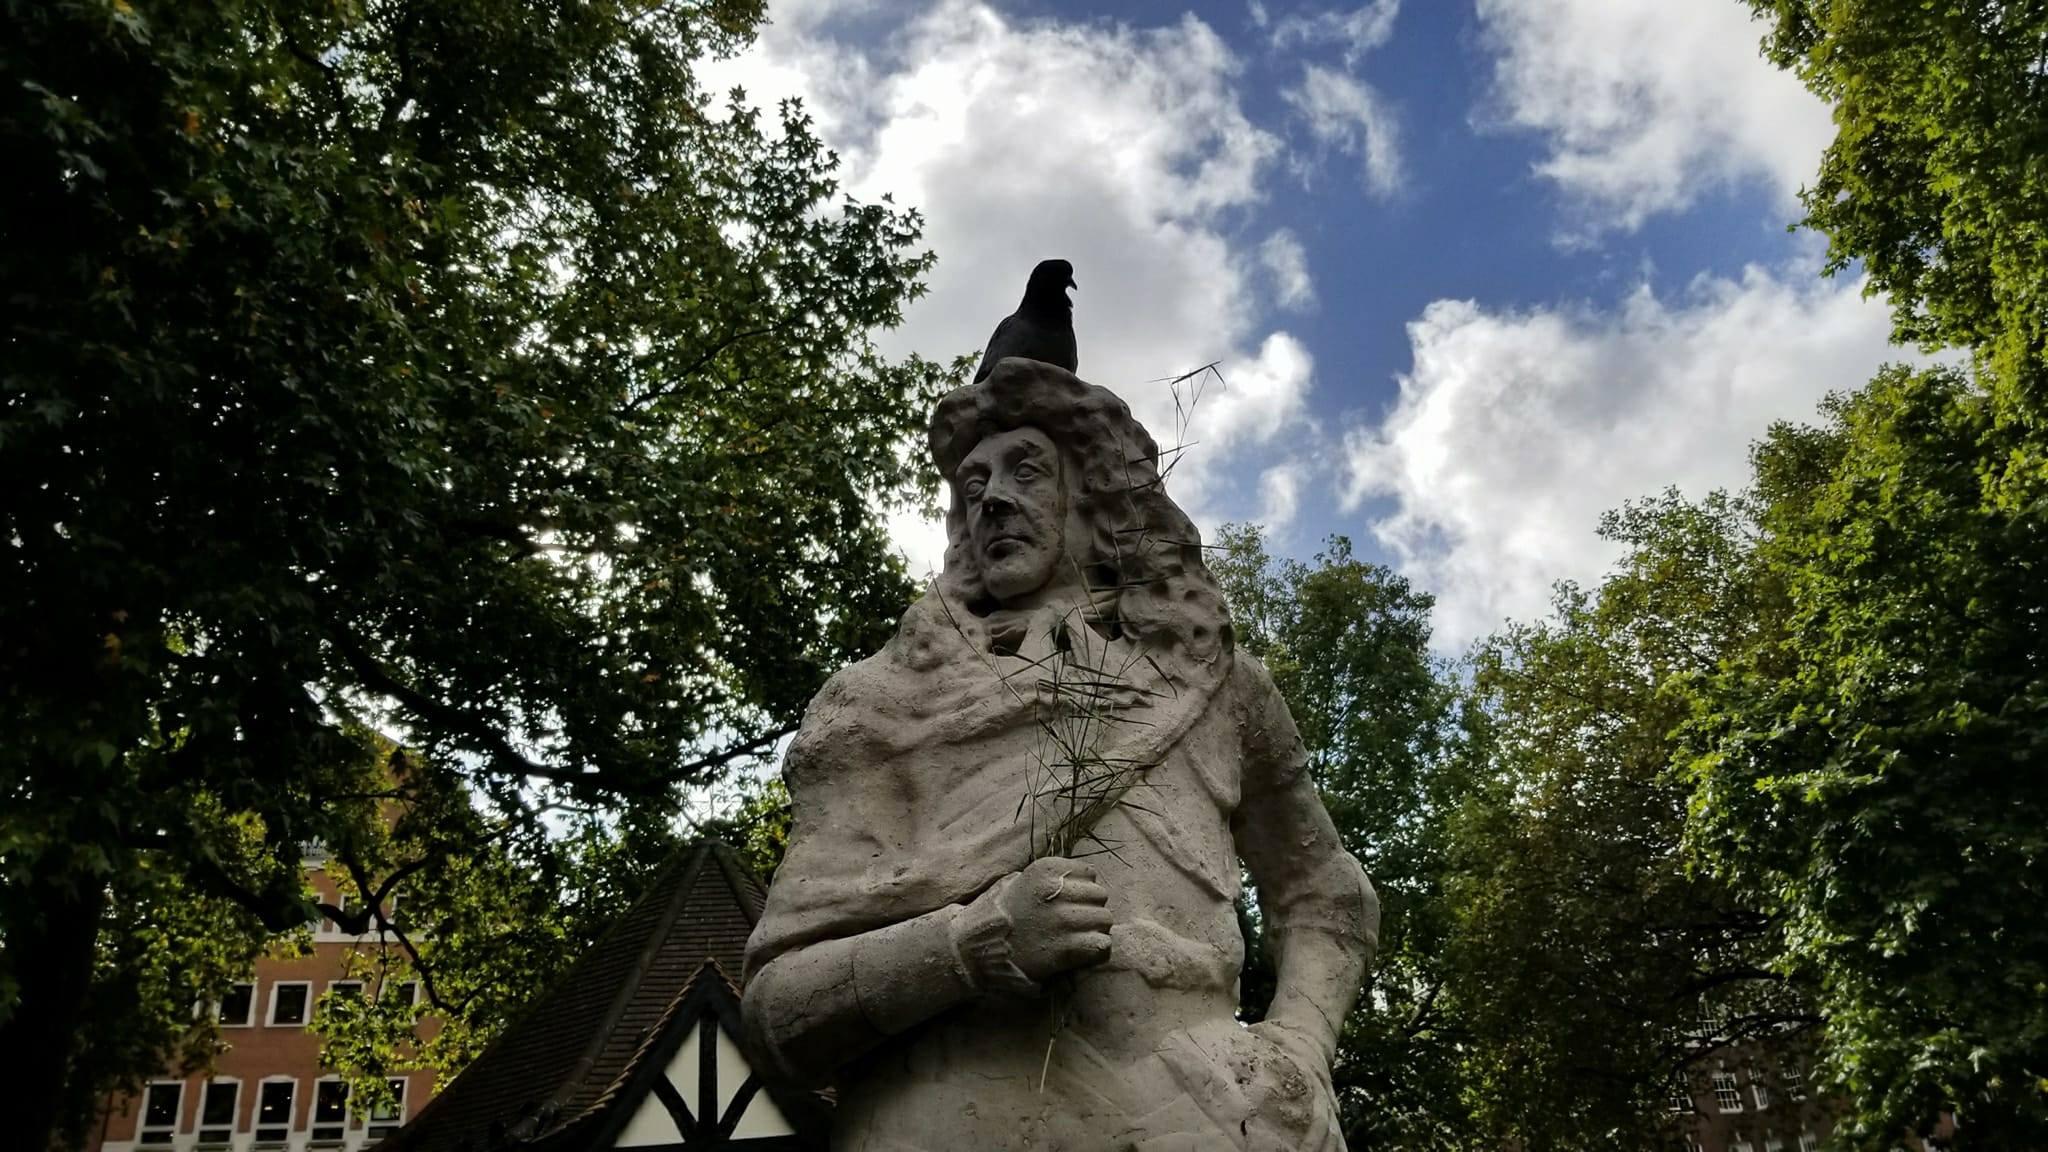 CAPAStudyAbroad_London_Fall2017_From Thaddeus Kaszuba - Charles II in SoHo Square.jpg